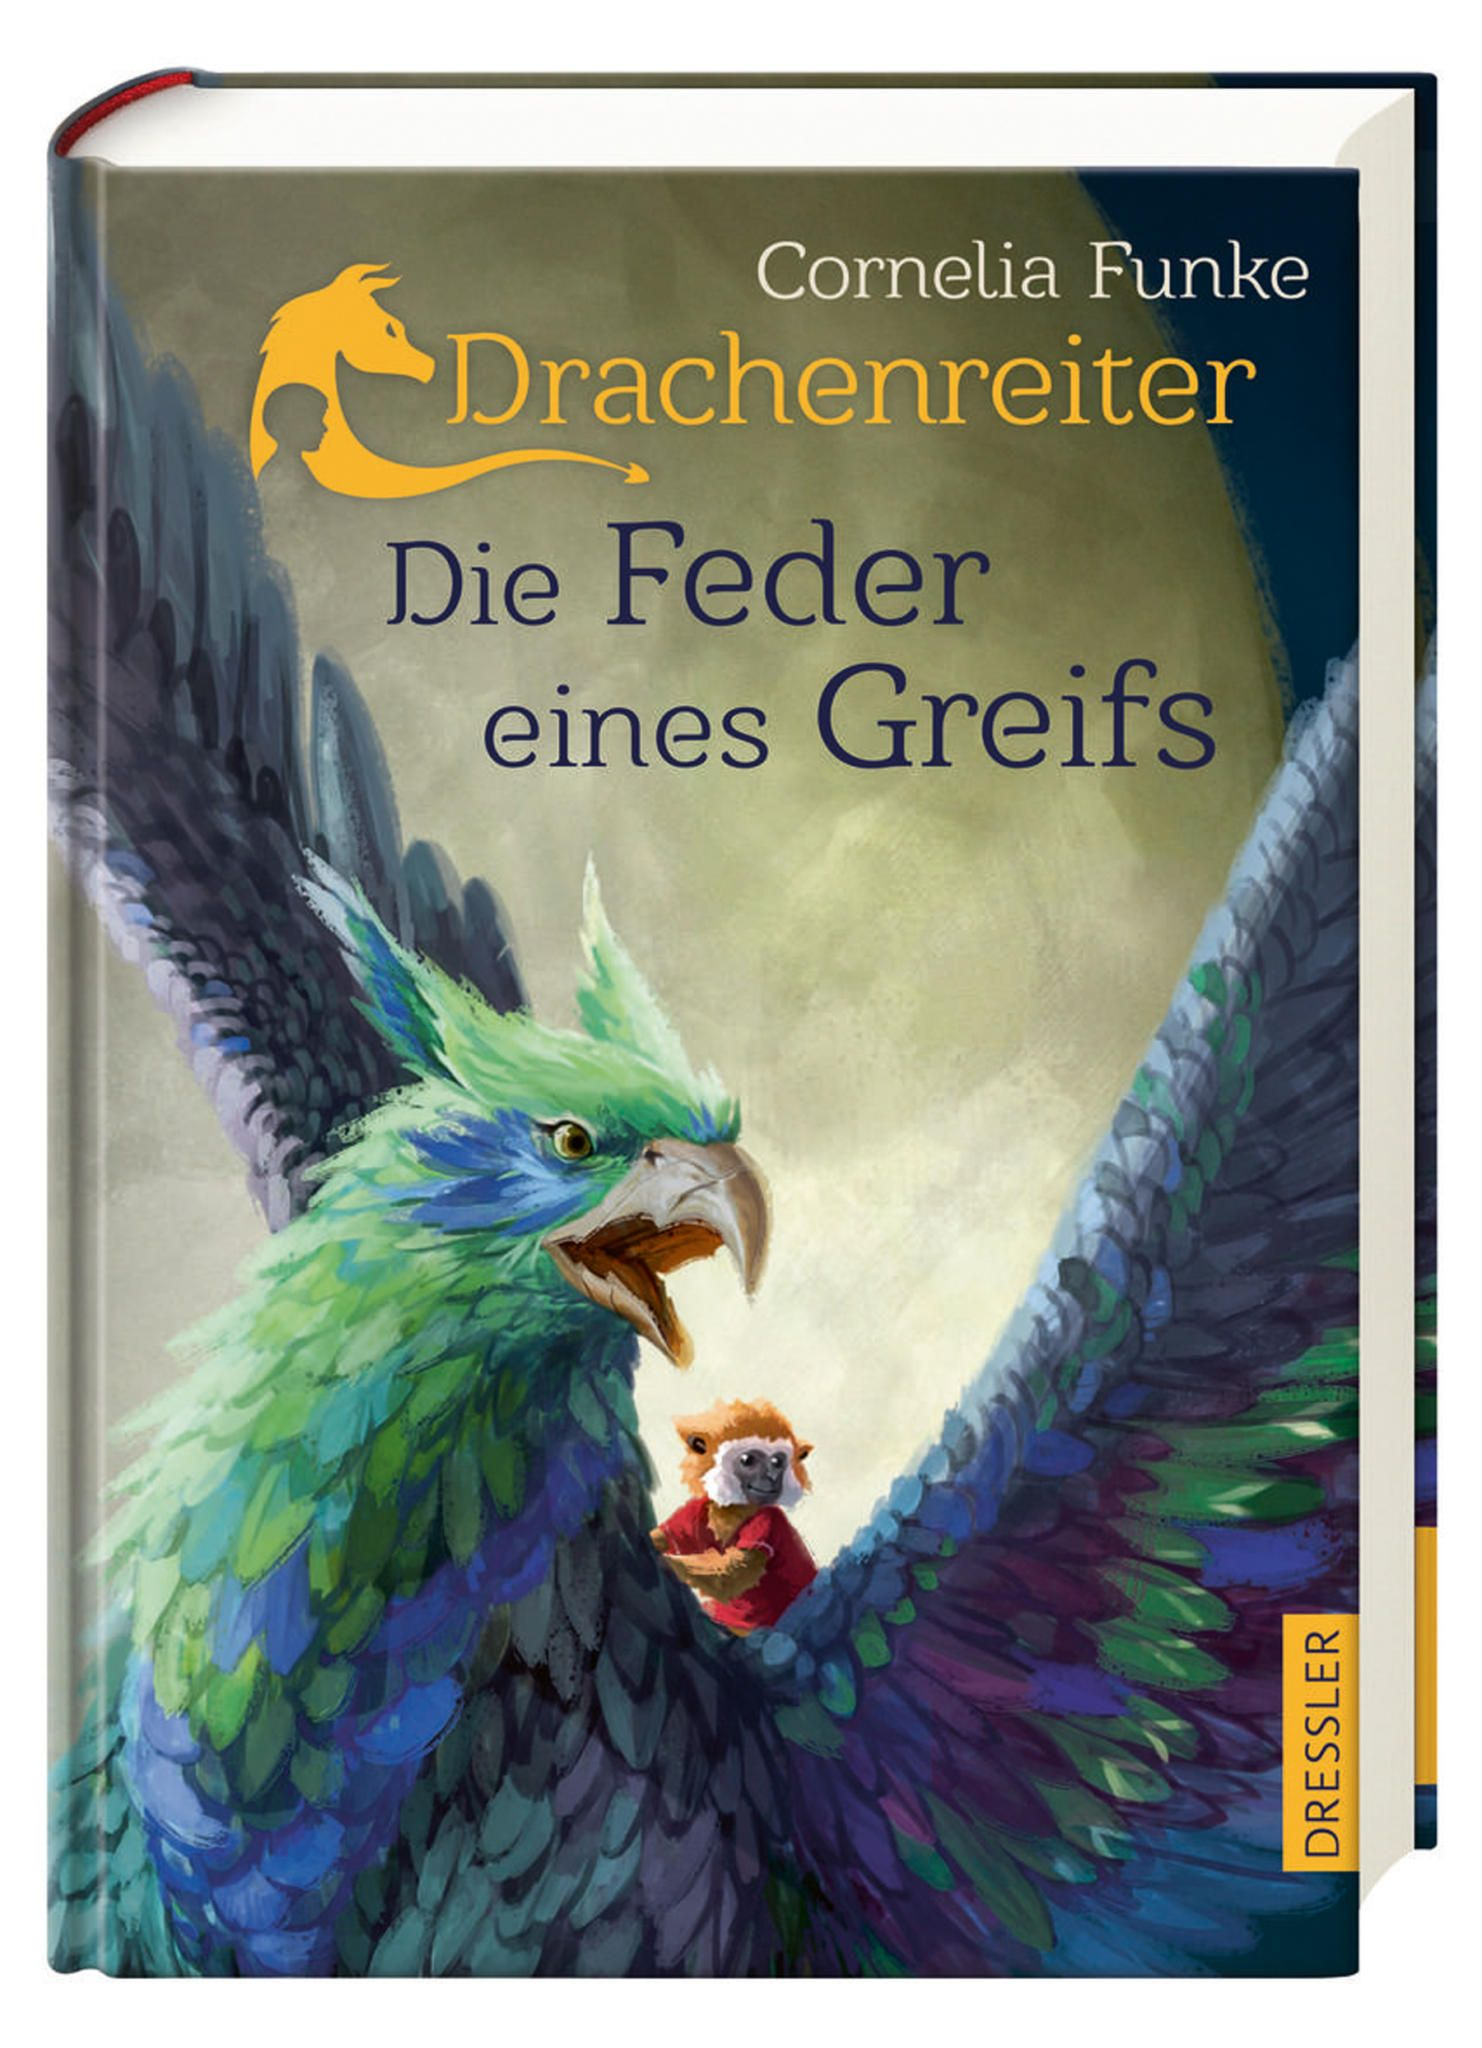 Die Feder Eines Greifs Funke Dpa Handout Dressler Verlag